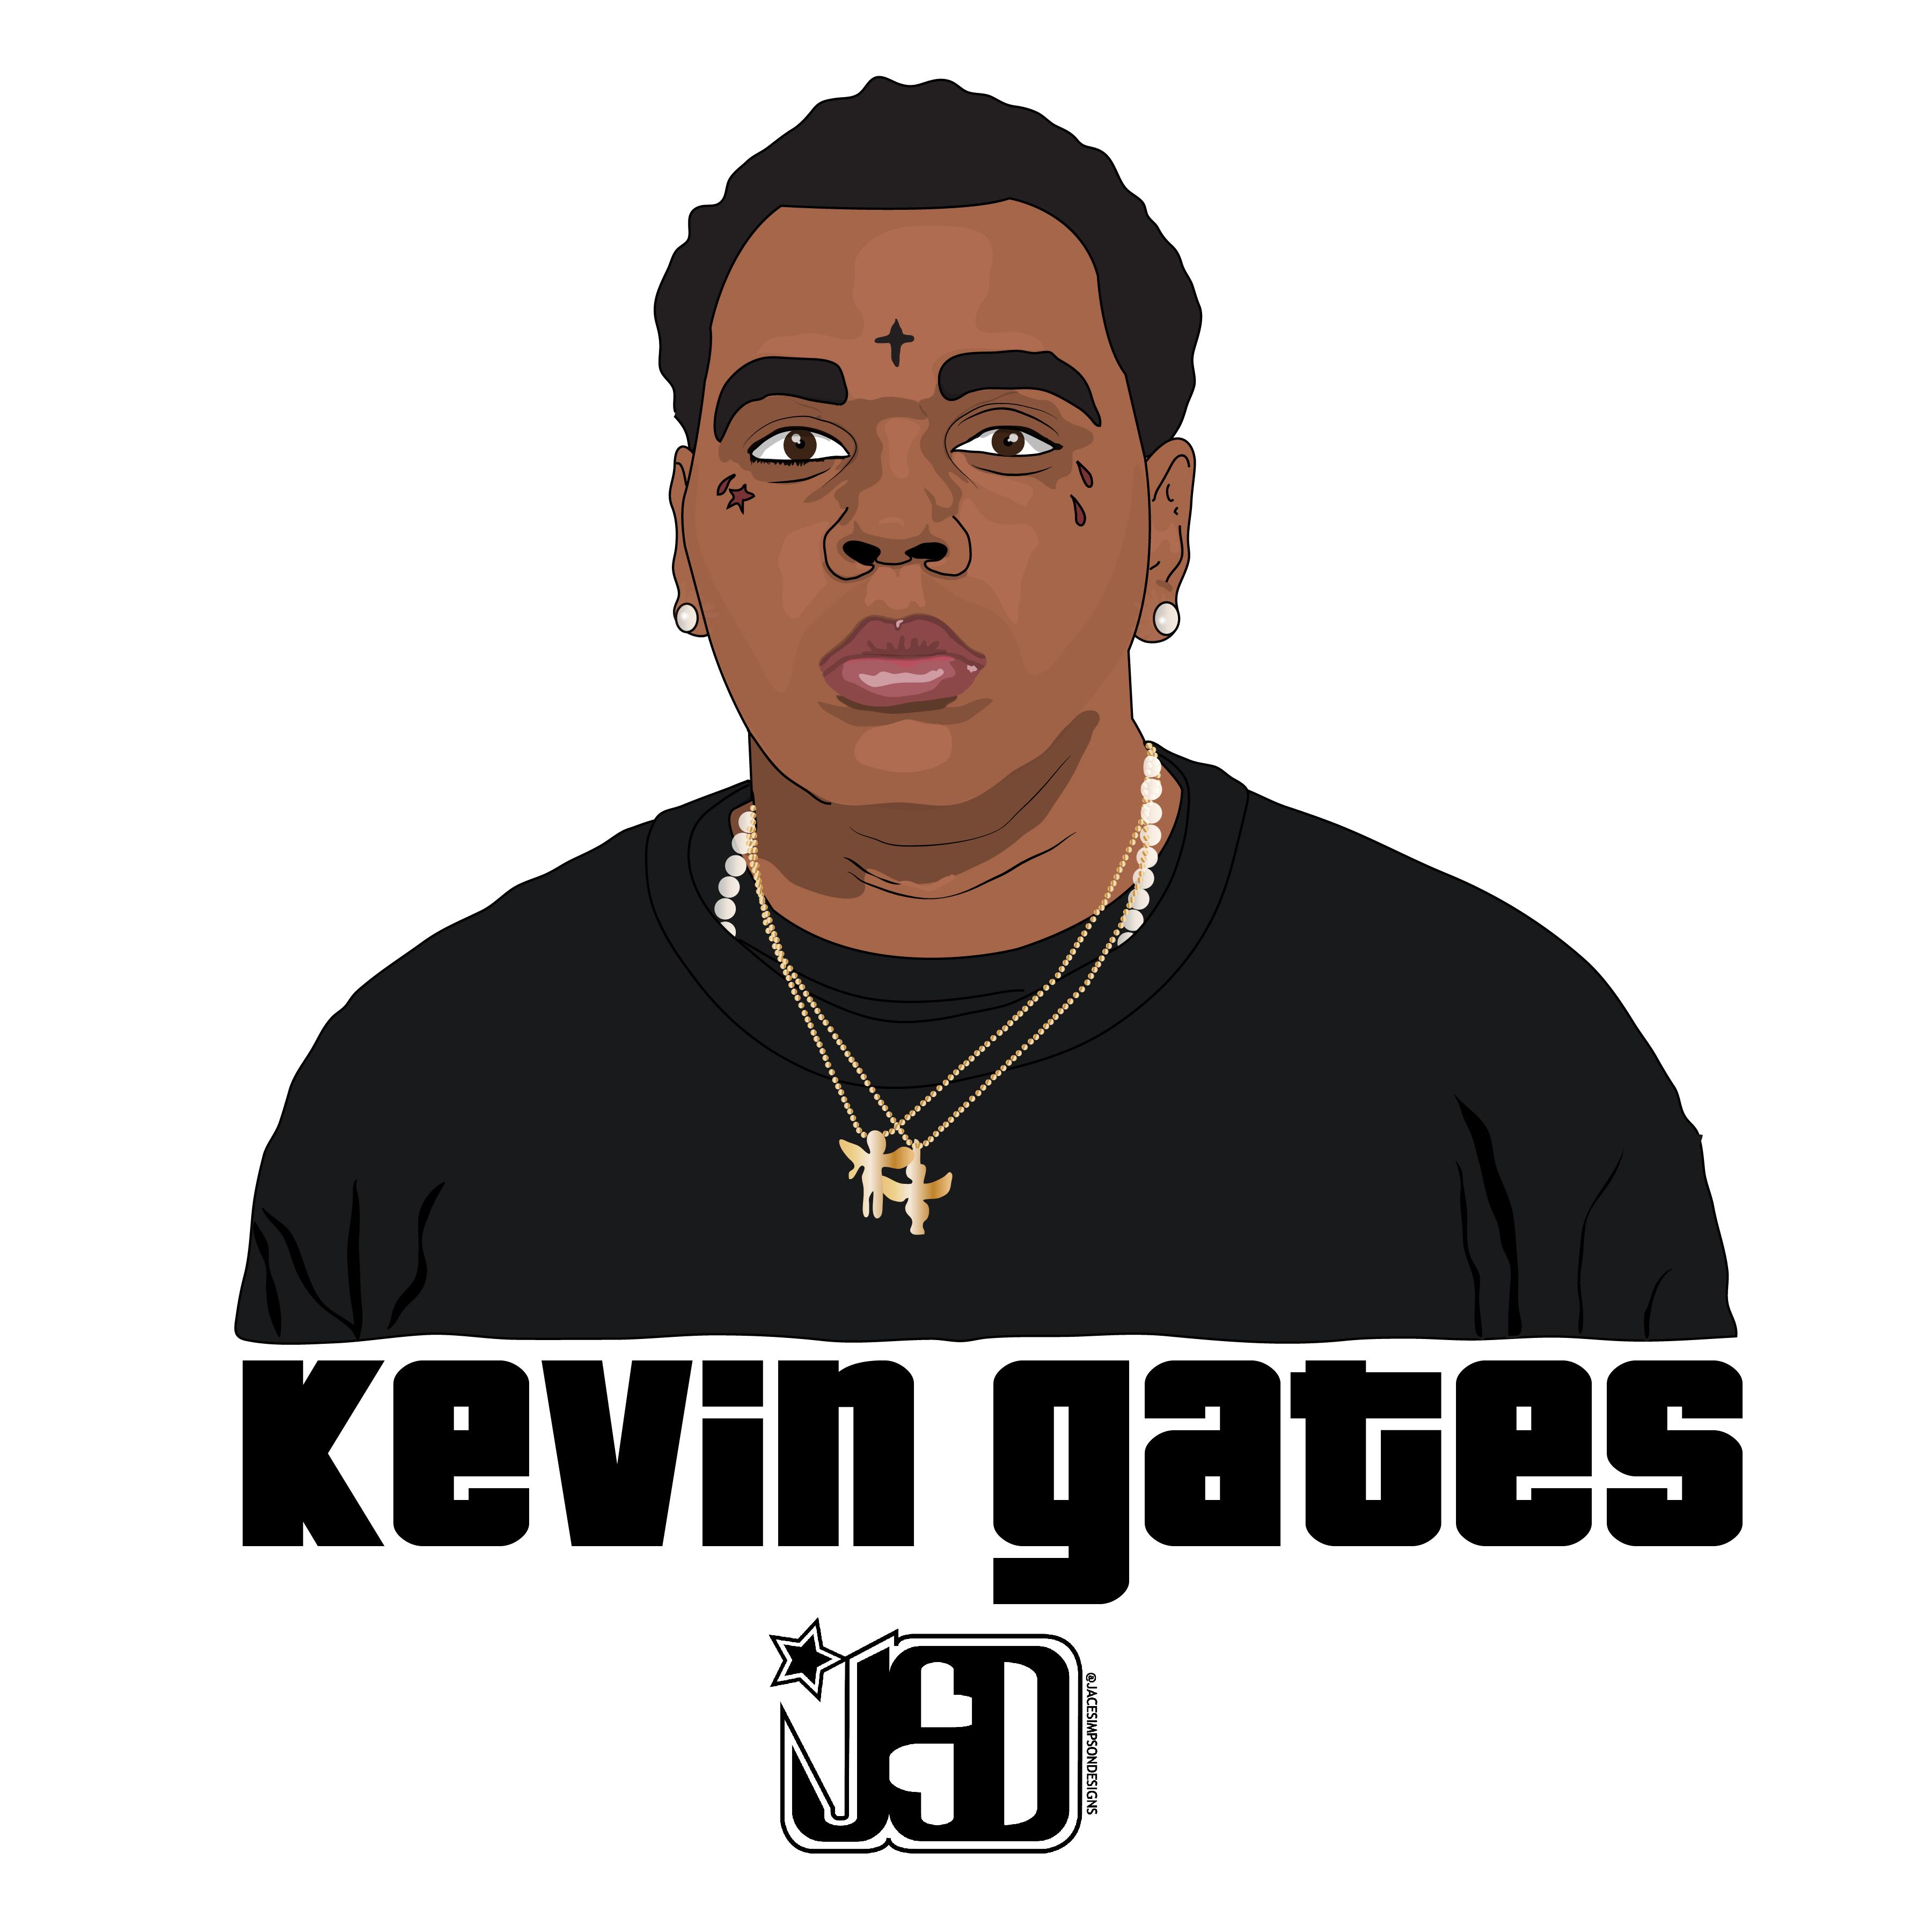 Kevin Gates Wallpaper: Kevin Gates By Jacesimpsondesigns On DeviantArt